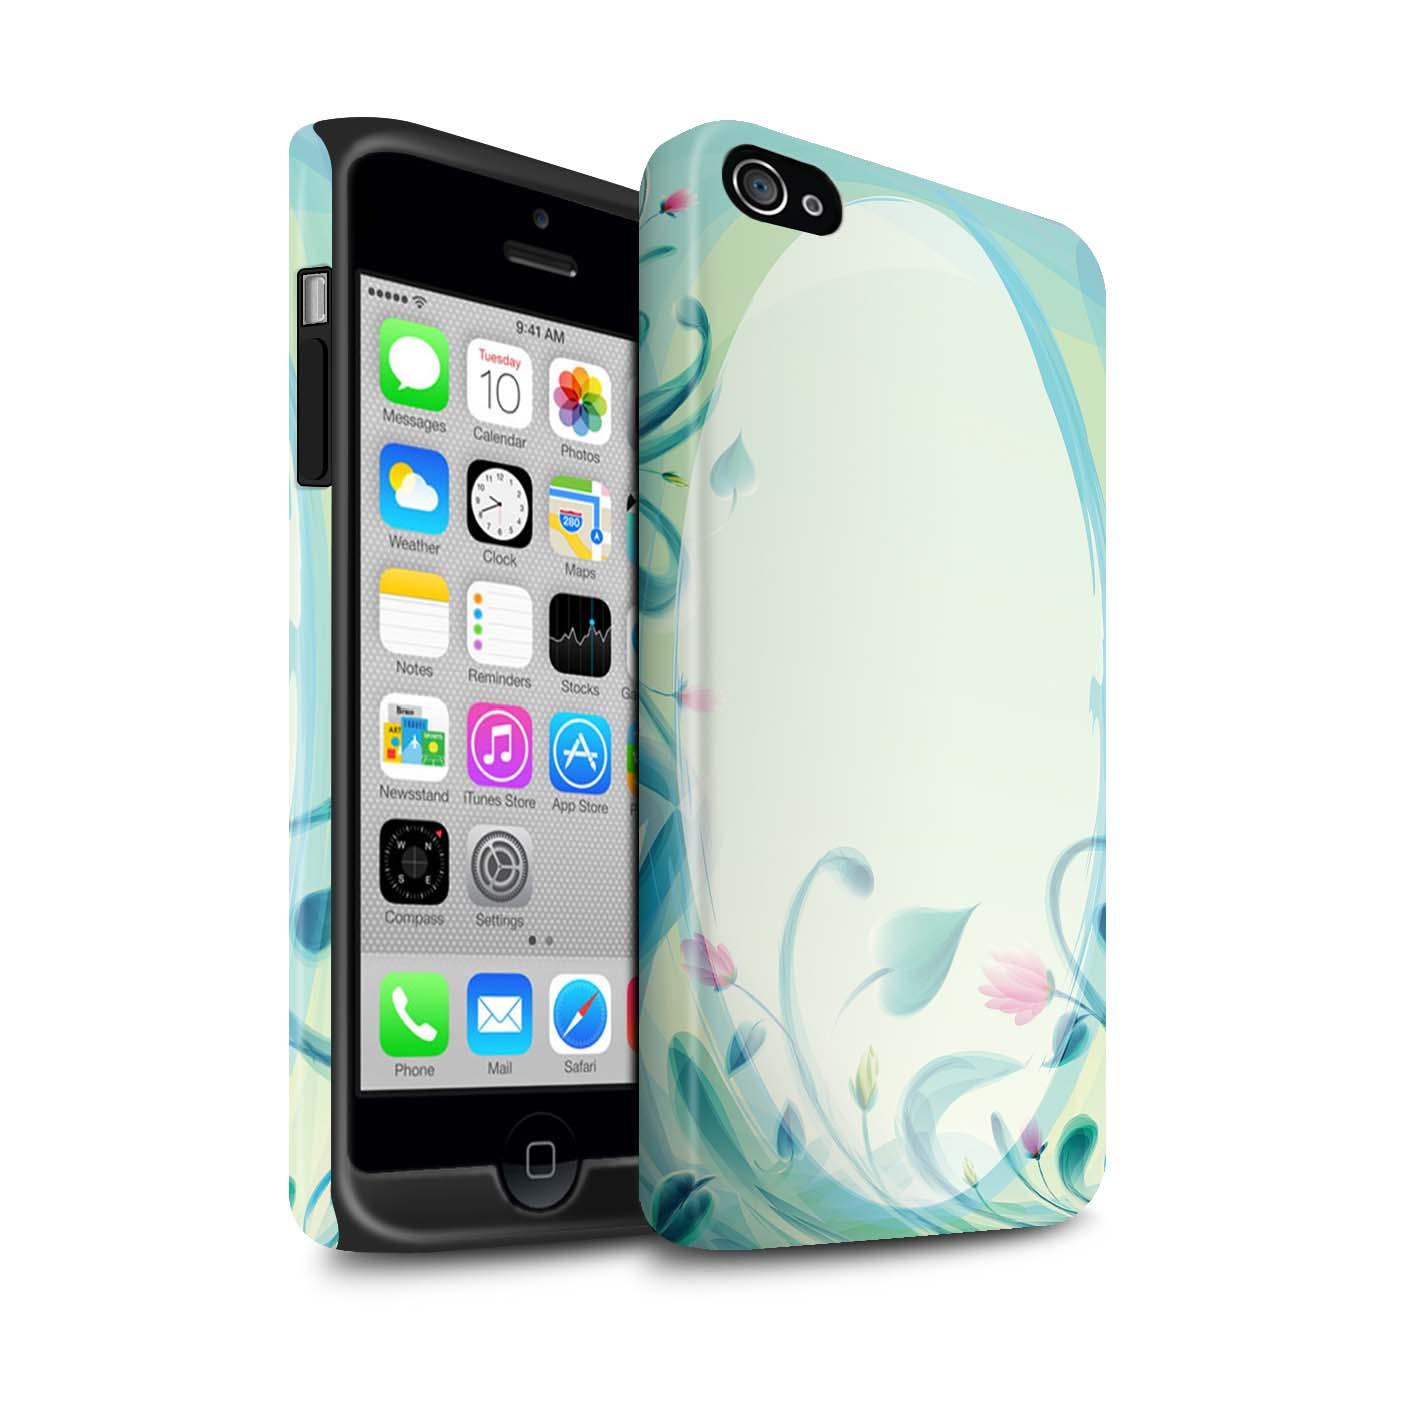 STUFF4-Coque-Robuste-Matte-pour-Apple-iPhone-Smartphone-Mode-Sarcelle-Etui